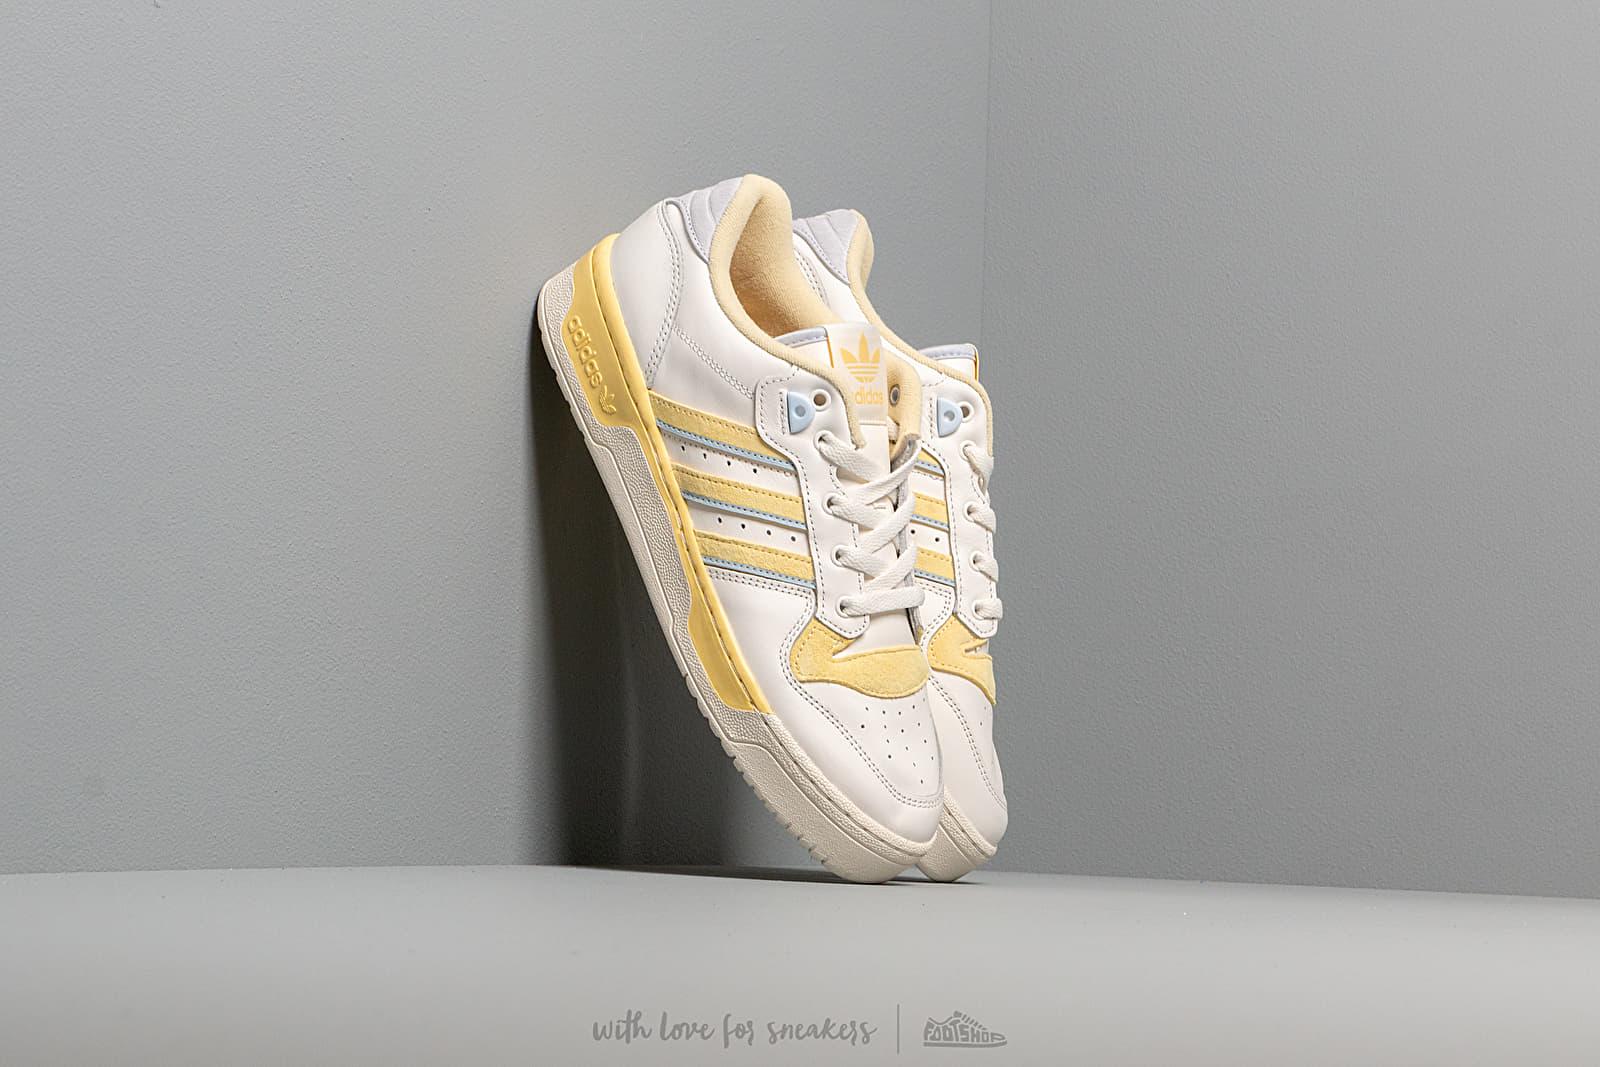 Cloud Off Easy Adidas Low YellowFootshop Rivalry White thQxrsdC